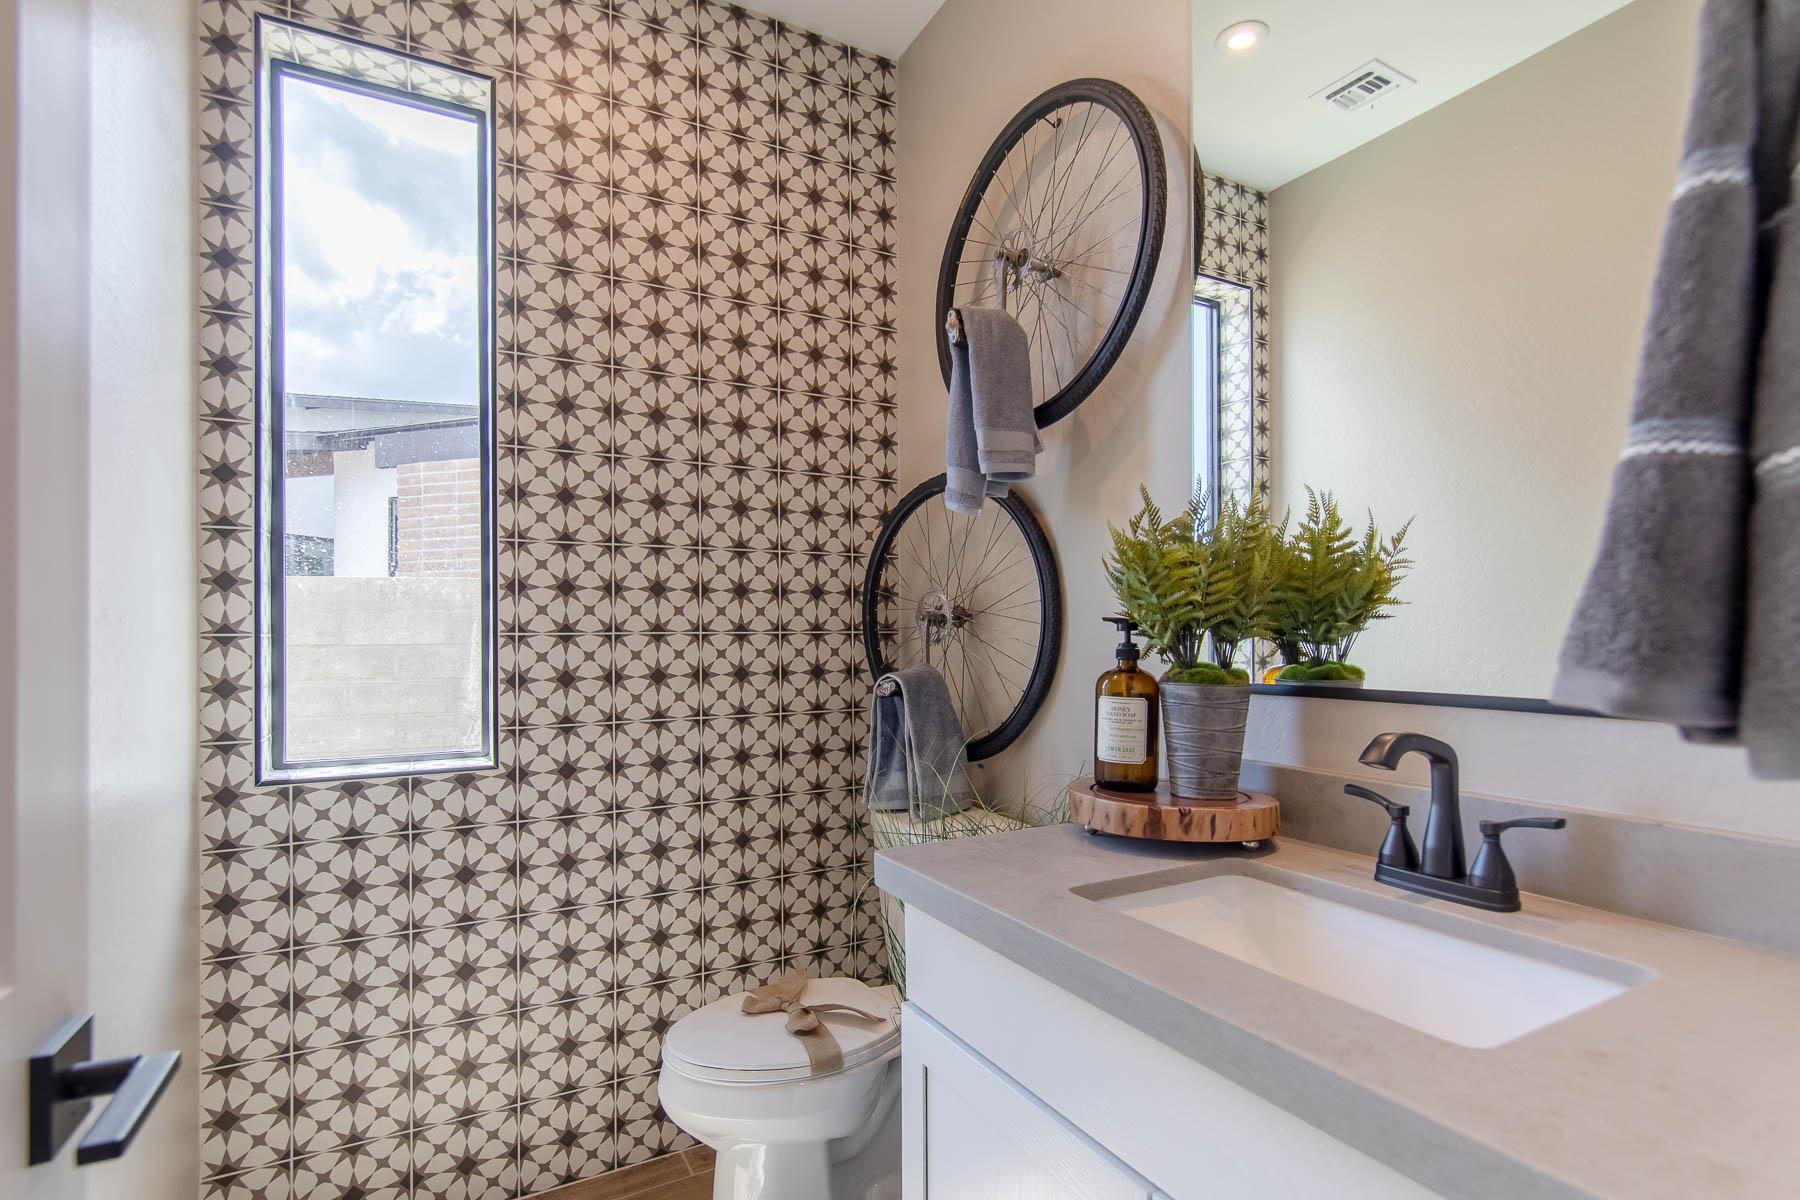 Bathroom featured in the J604 By Mandalay Homes in Prescott, AZ